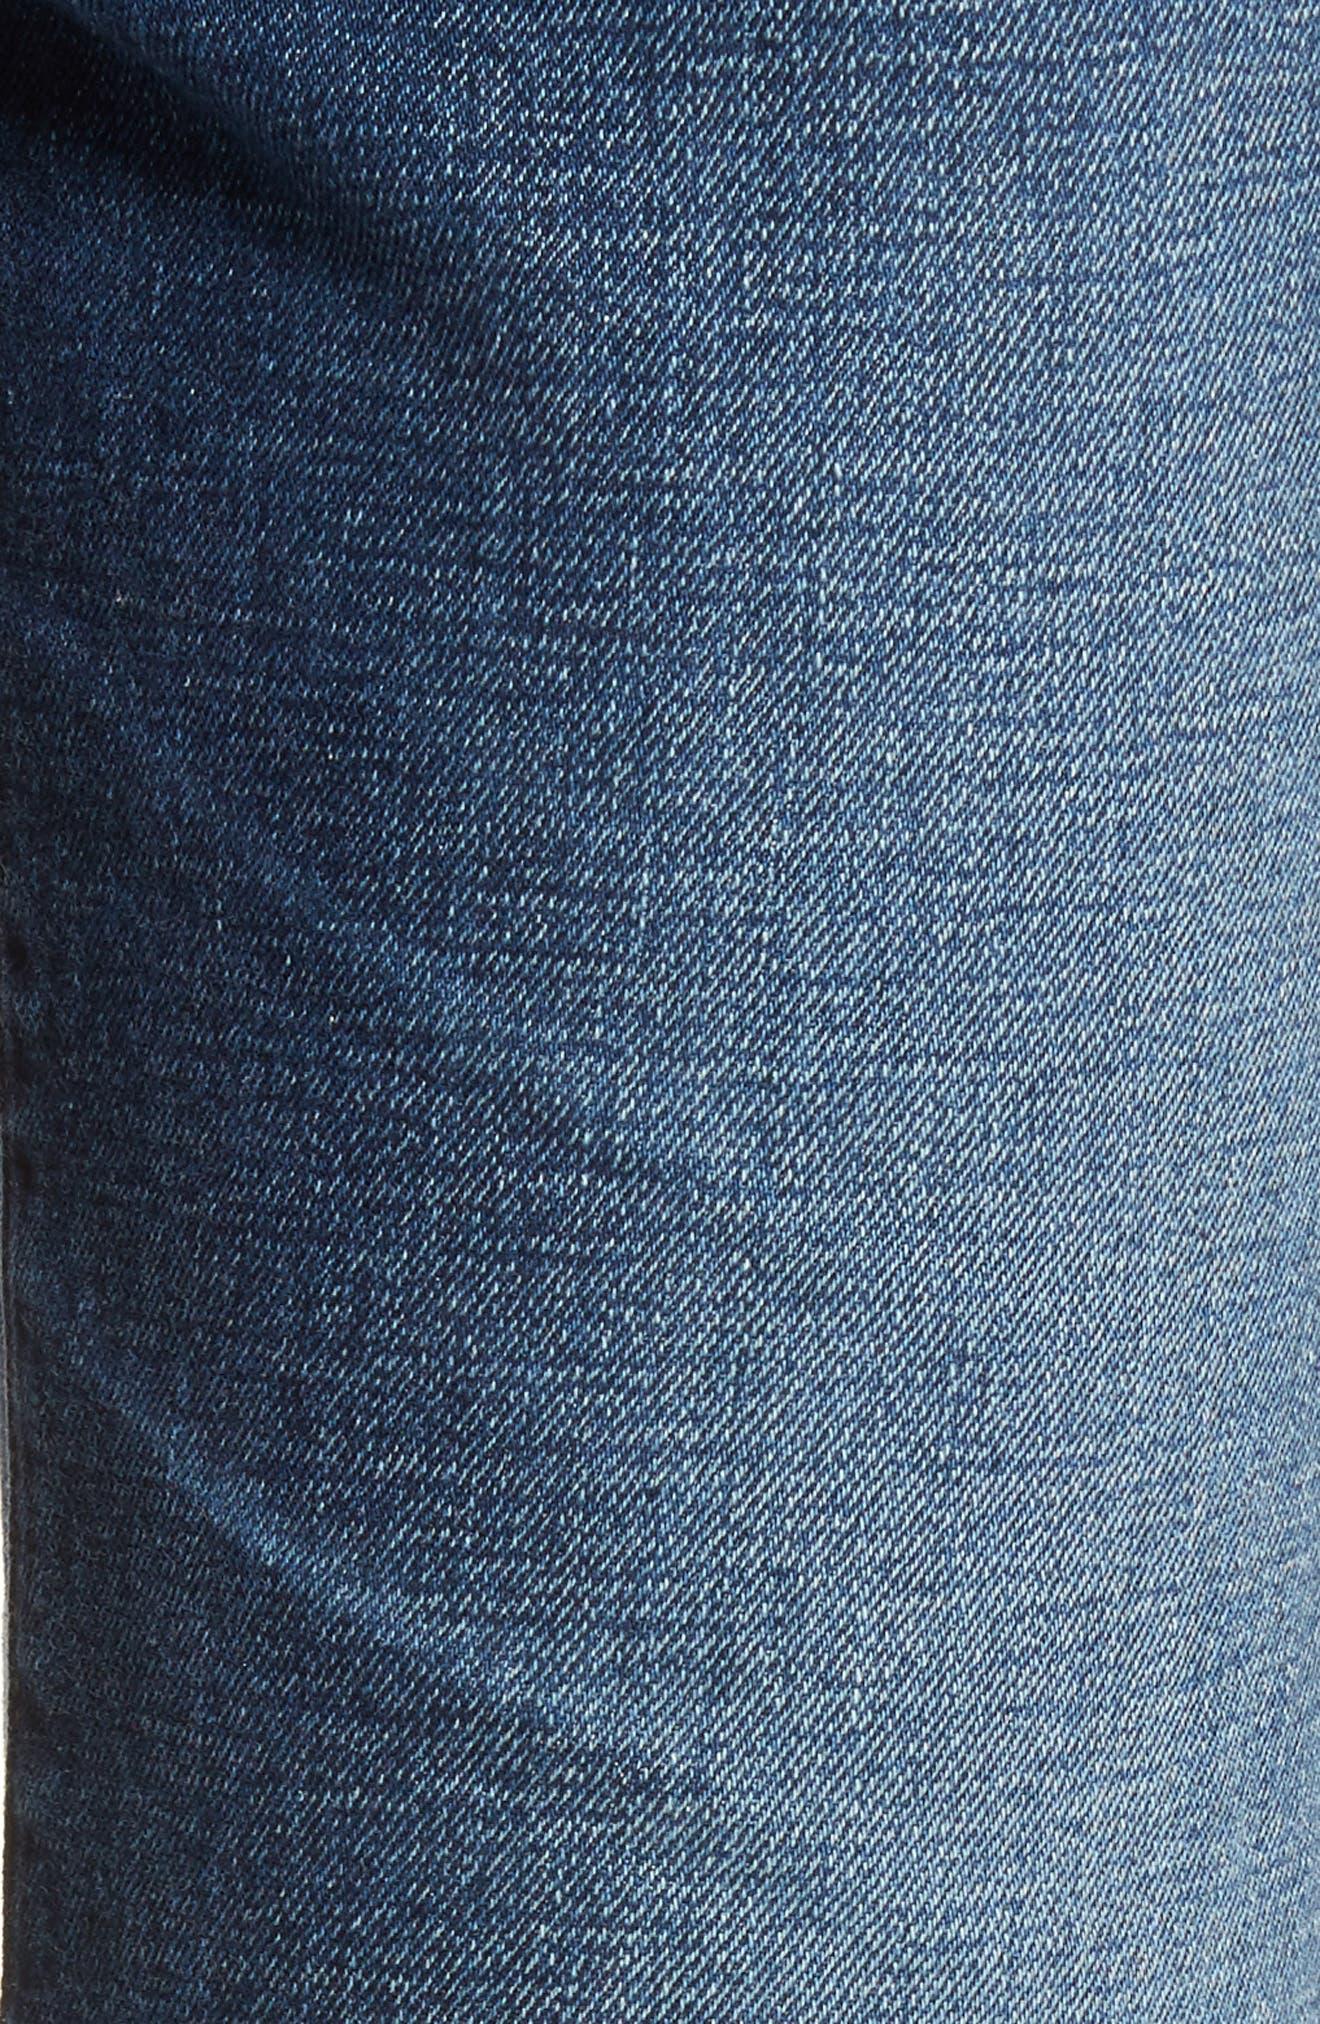 The Rhett Vintage High Waist Crop Jeans,                             Alternate thumbnail 6, color,                             415